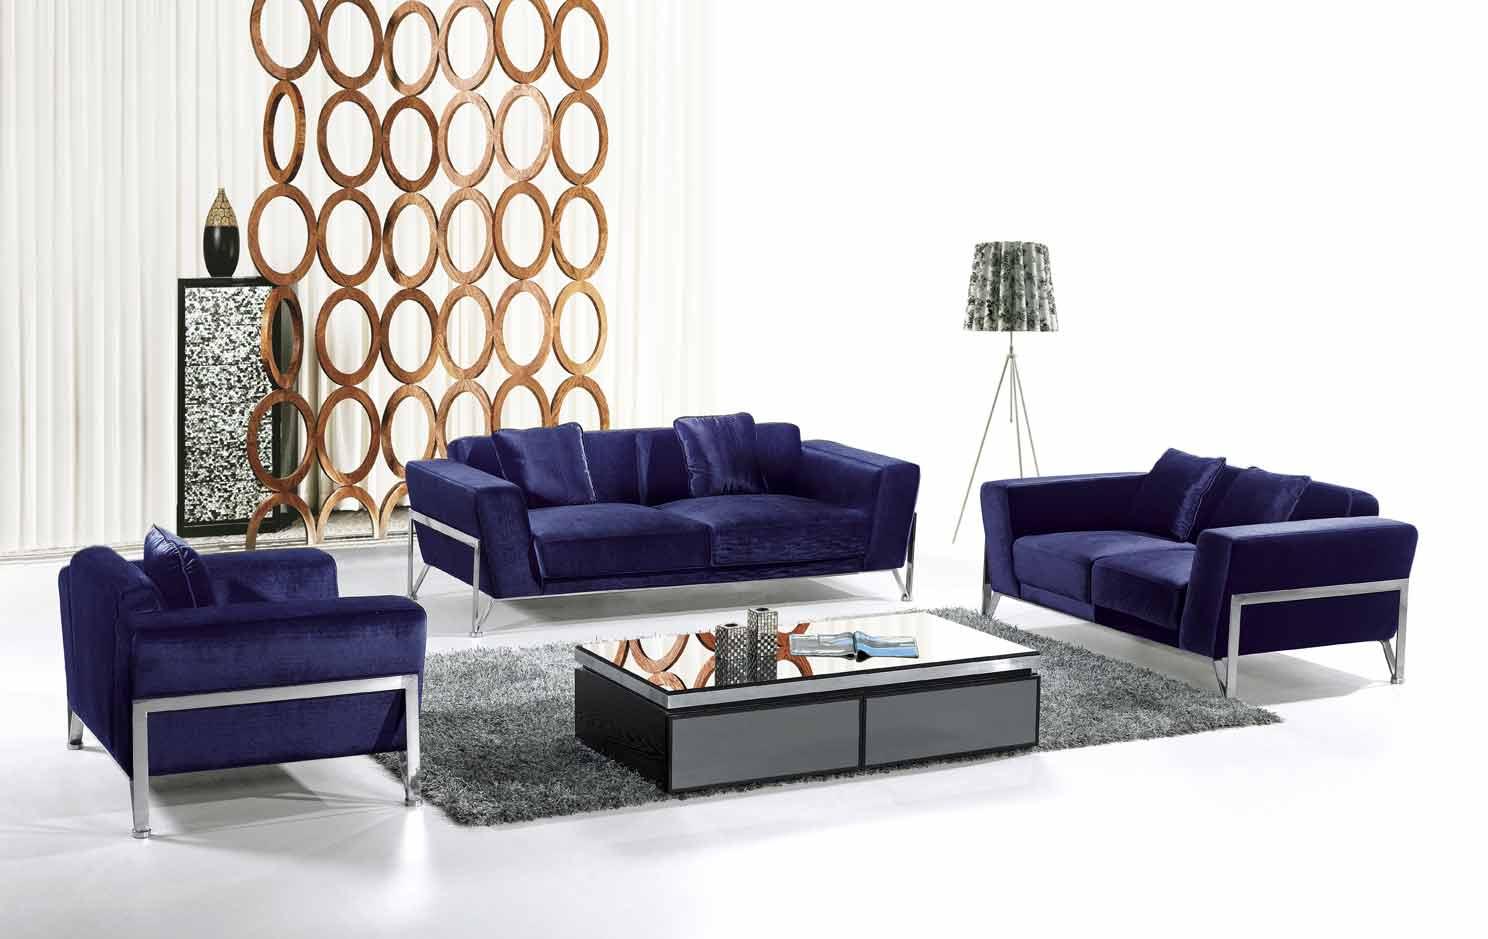 sofa set designs for small bedroom es grave o aguda 30 brilliant living room furniture ideas designbump